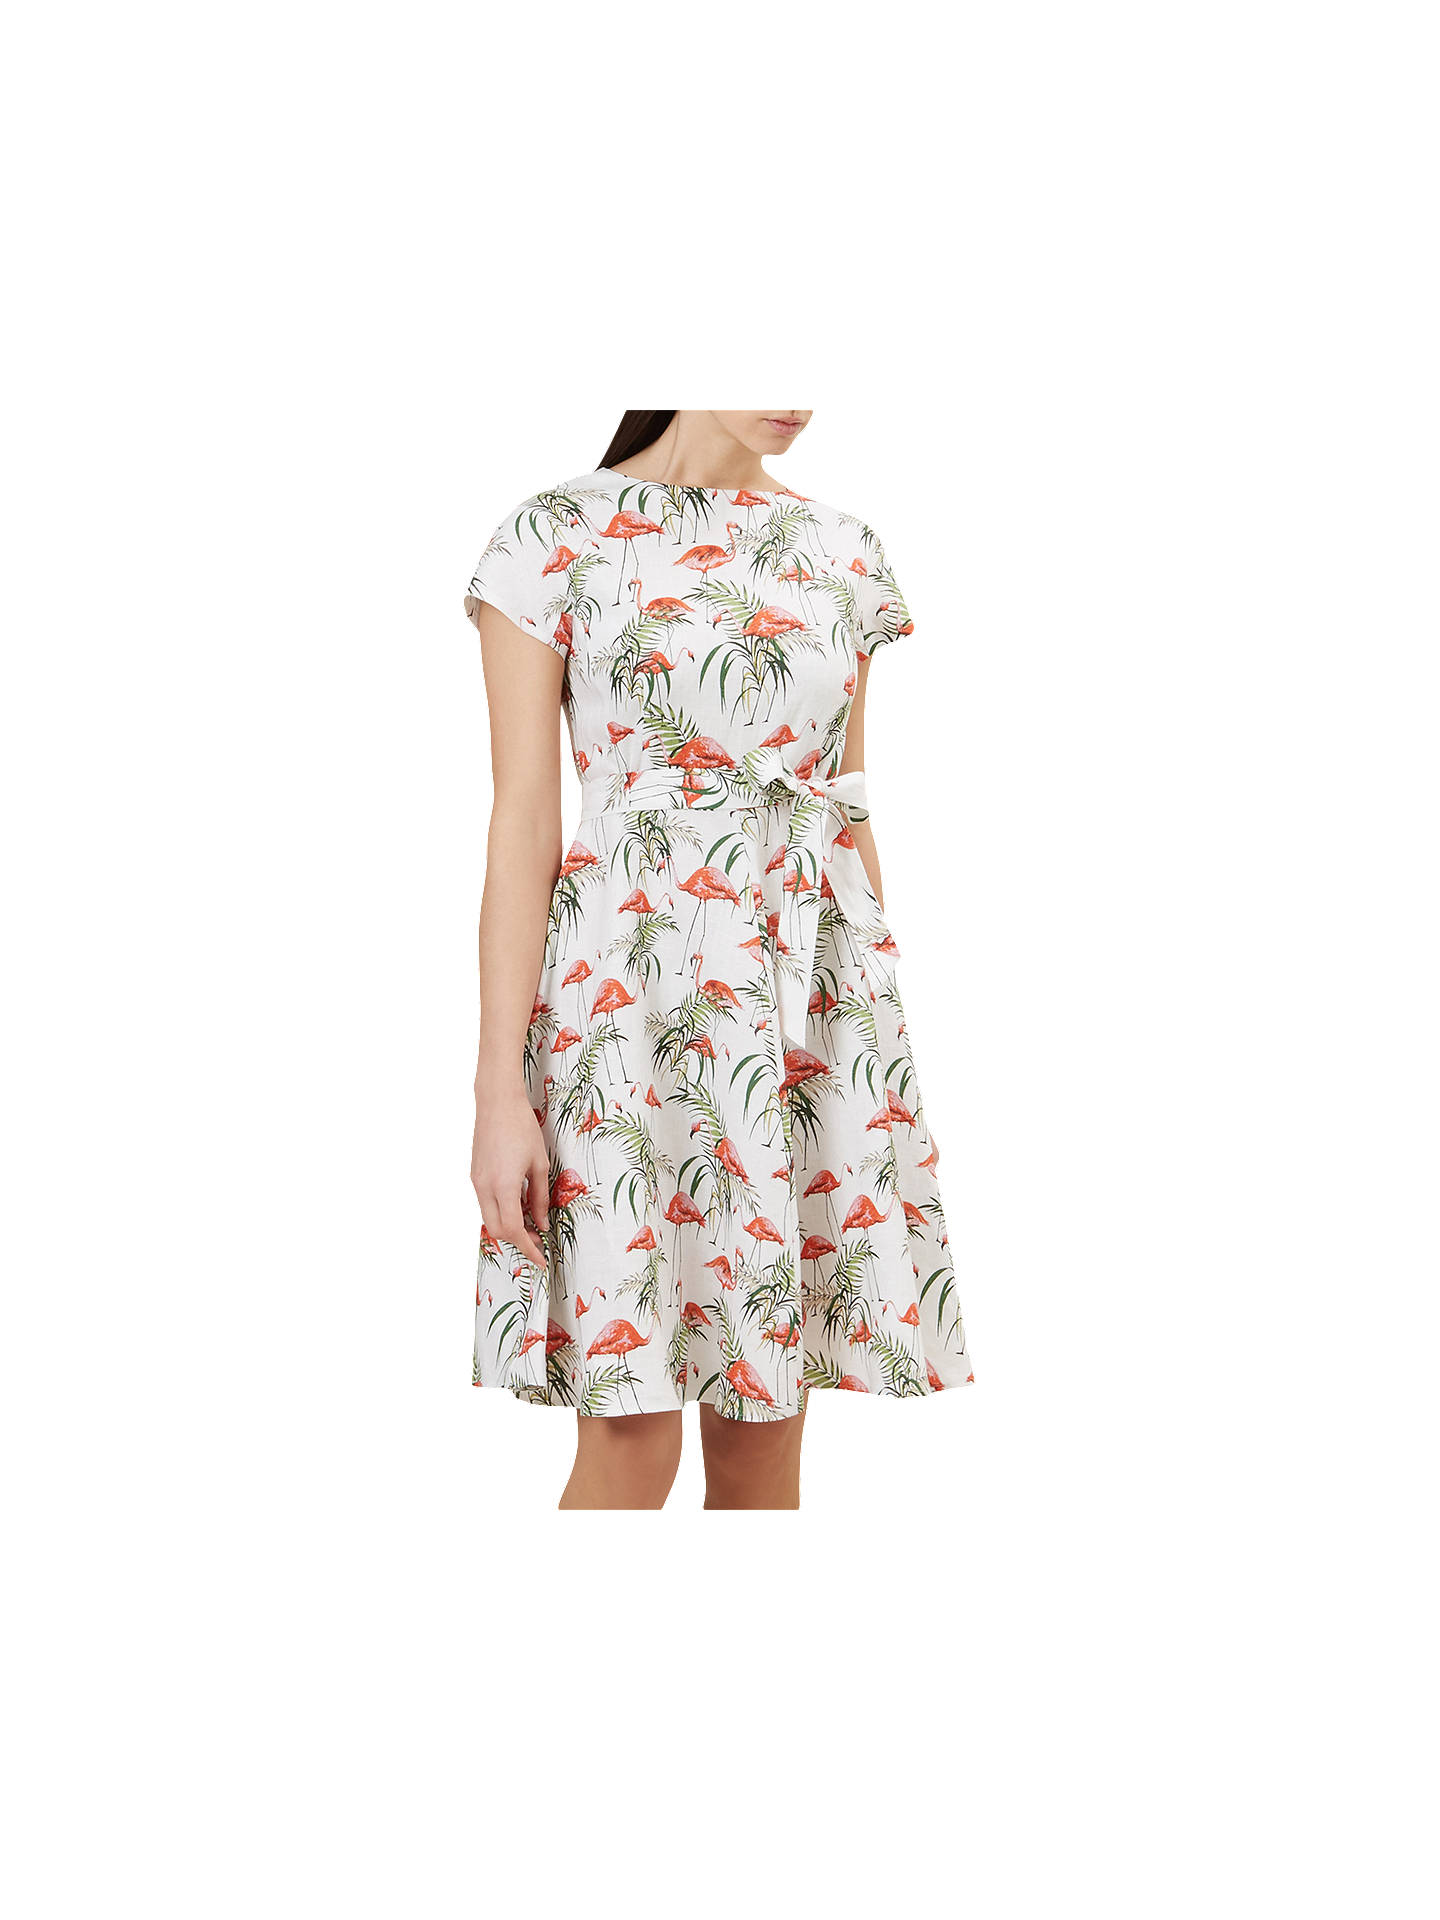 b47bf8a3a13 Buy Hobbs Sorrento Flamingo Print Flared Dress